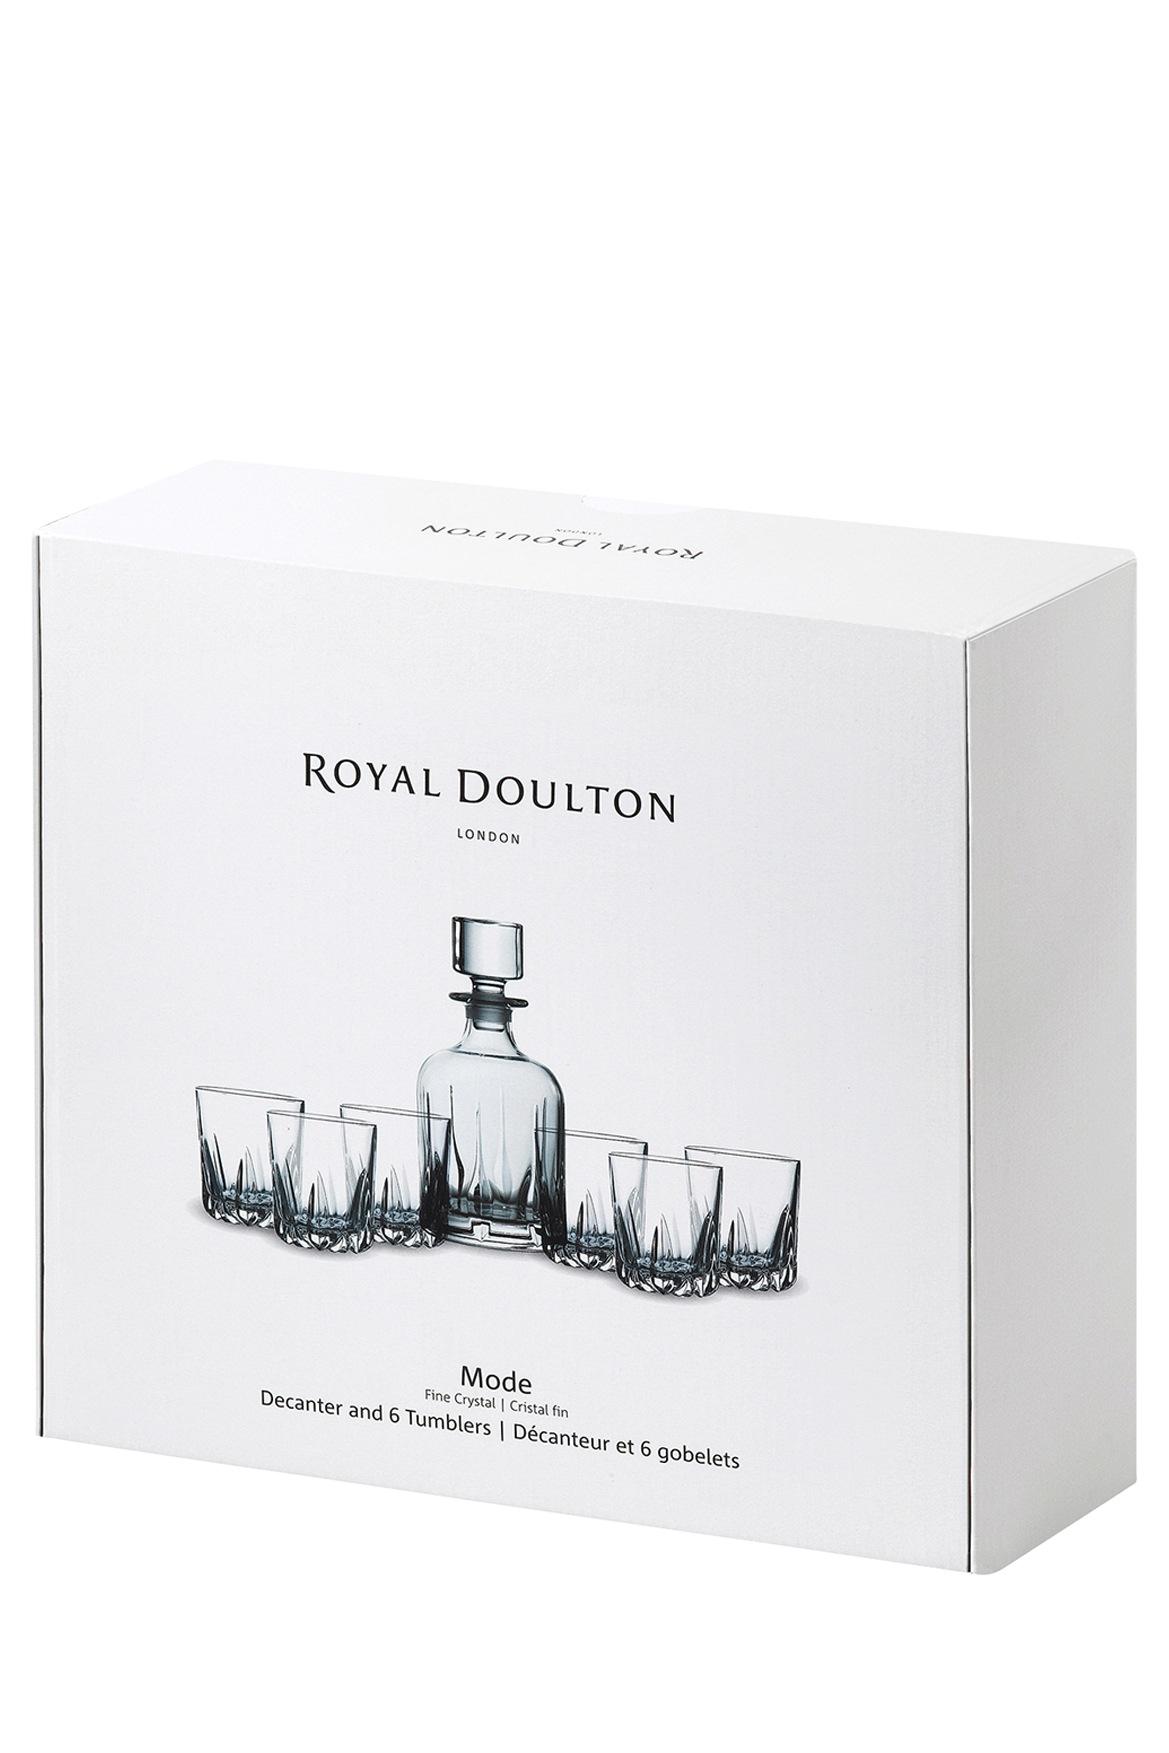 Myer Online - CategoryName. « » «»  sc 1 st  Myer & Royal Doulton   Mode Decanter Set   Myer Online